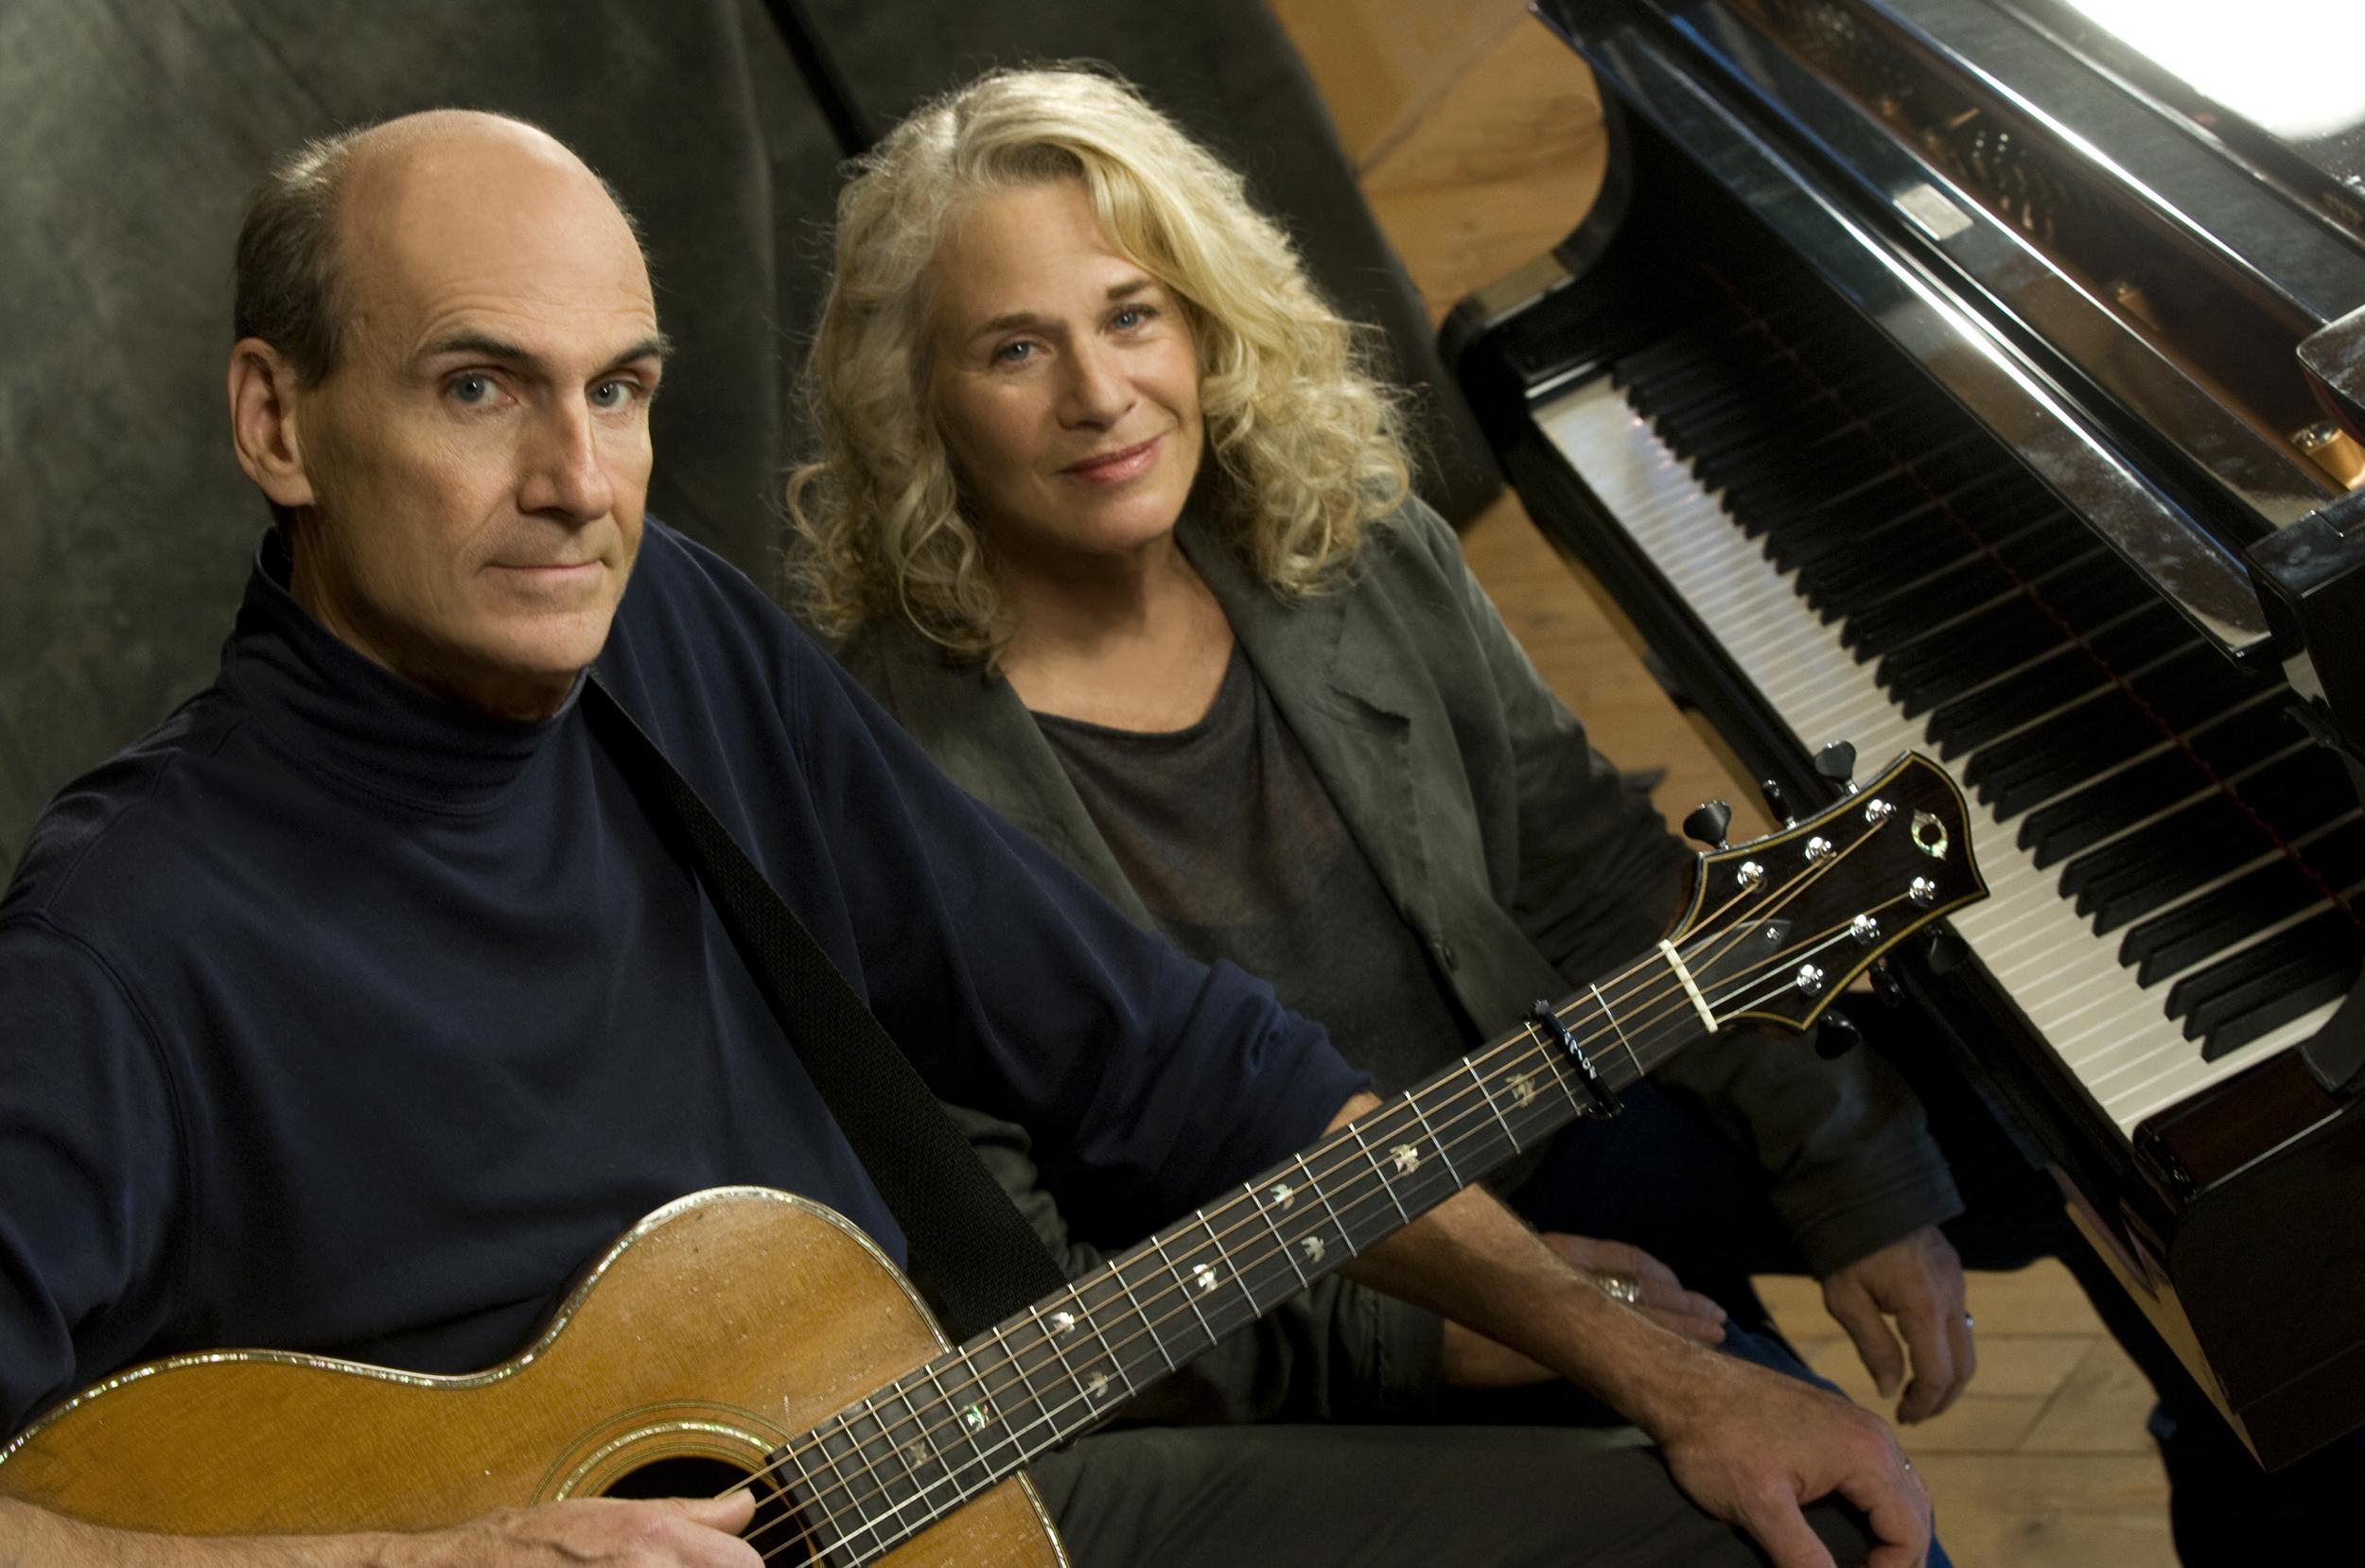 Carole_King_and_James_Taylor.JPG